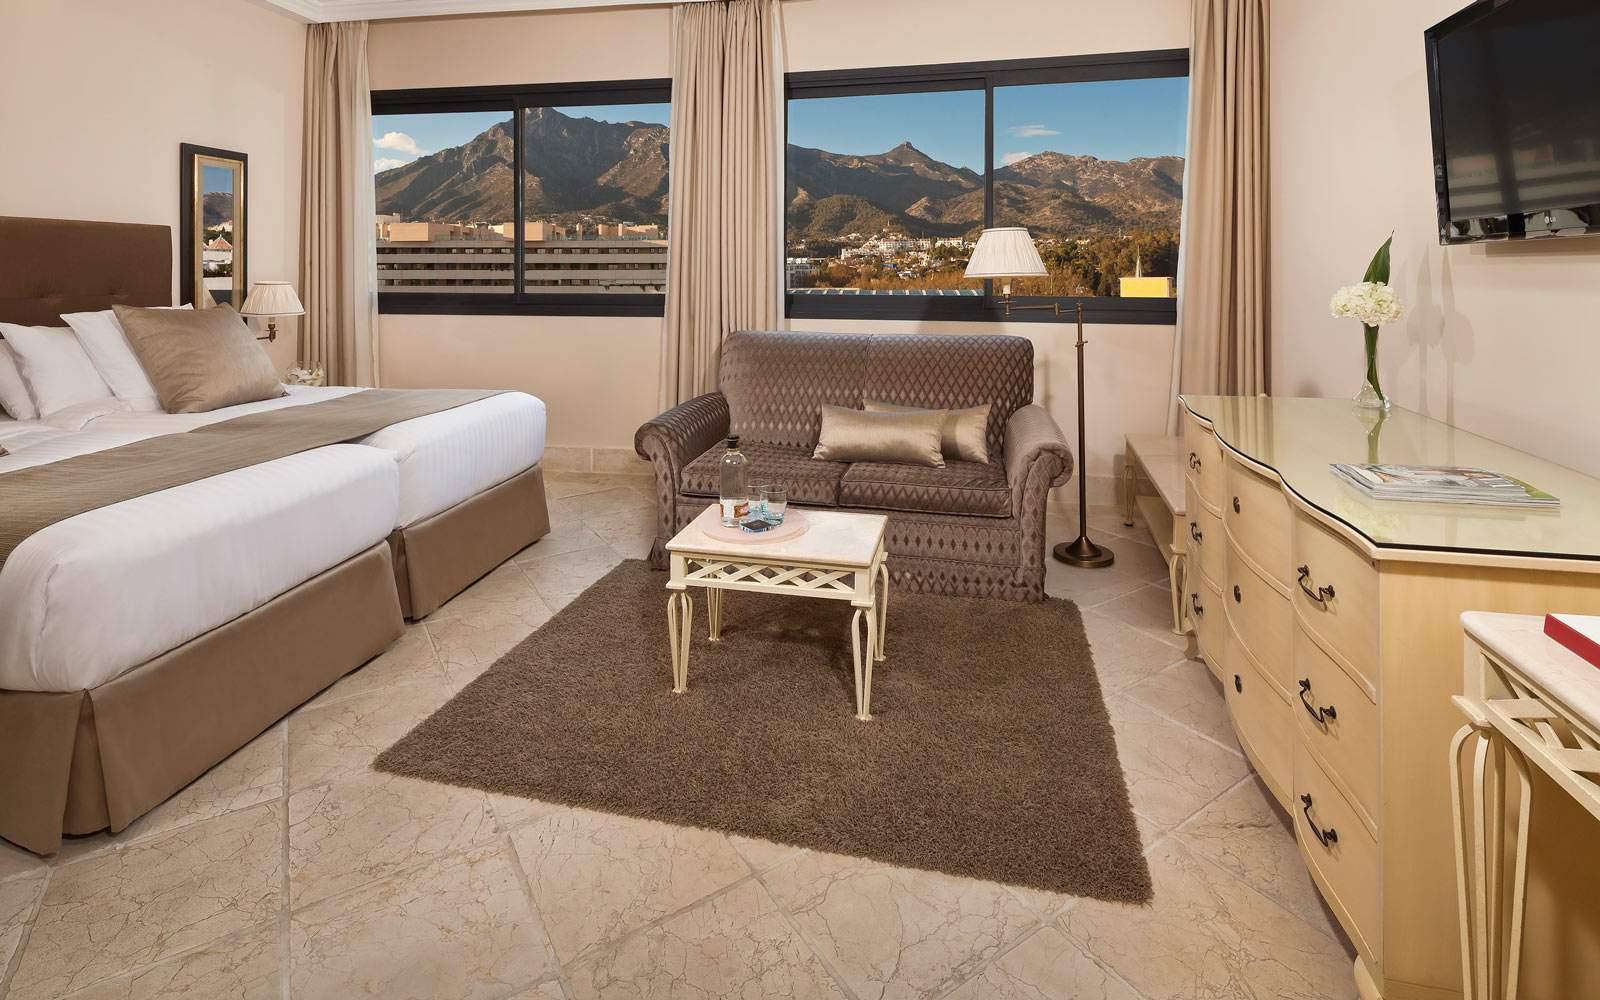 Hotel Gran Melia Don Pepe - Classic room